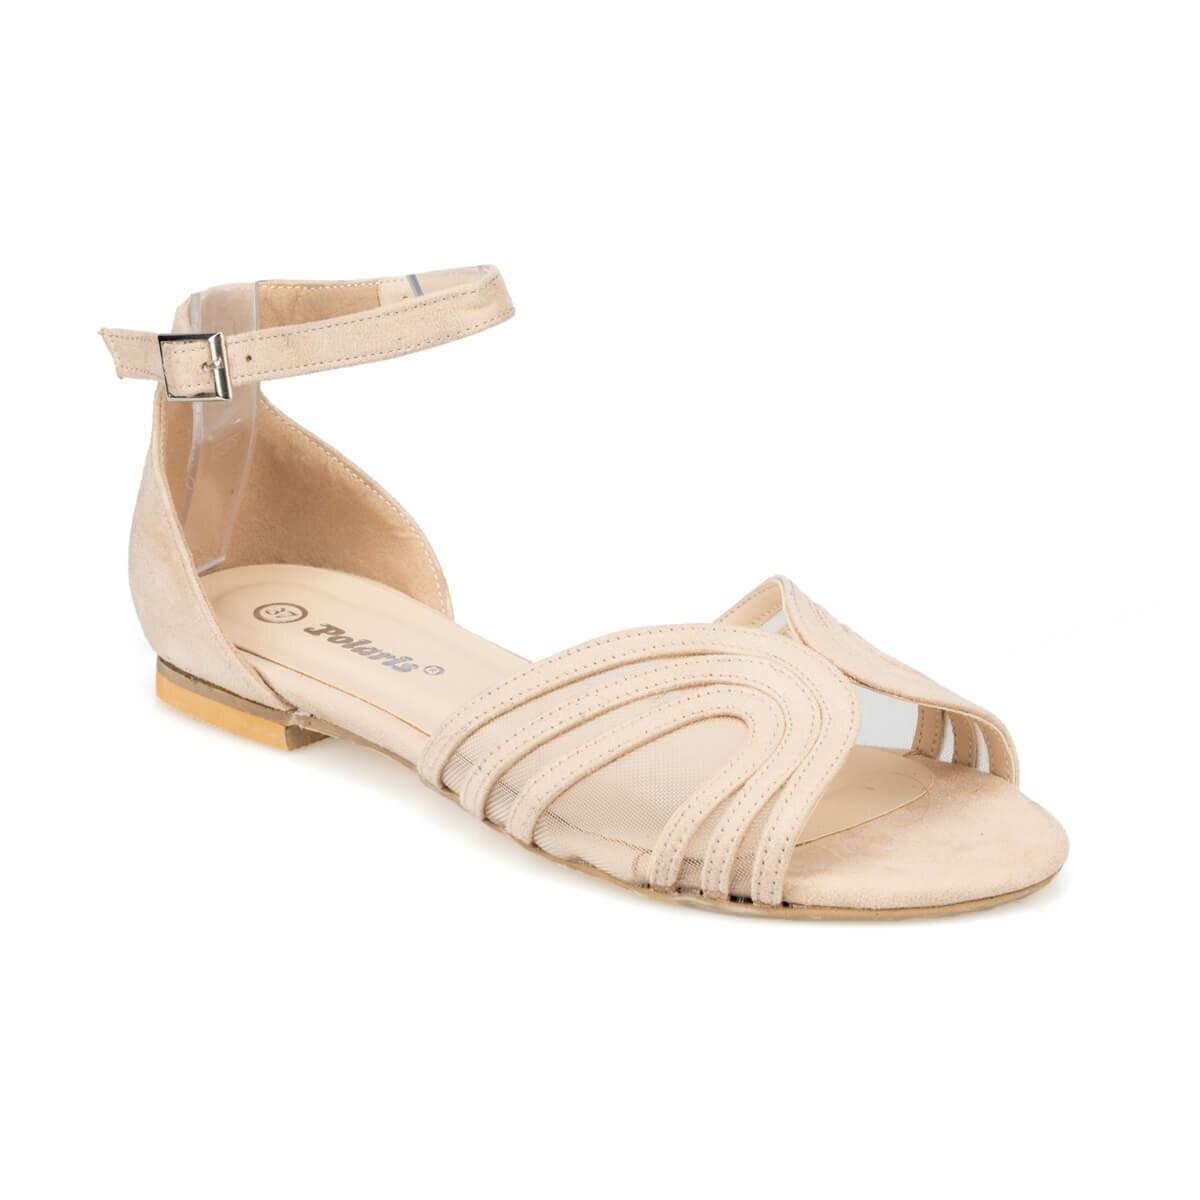 FLO 91.313289.Z Beige Women 'S Sandals Polaris